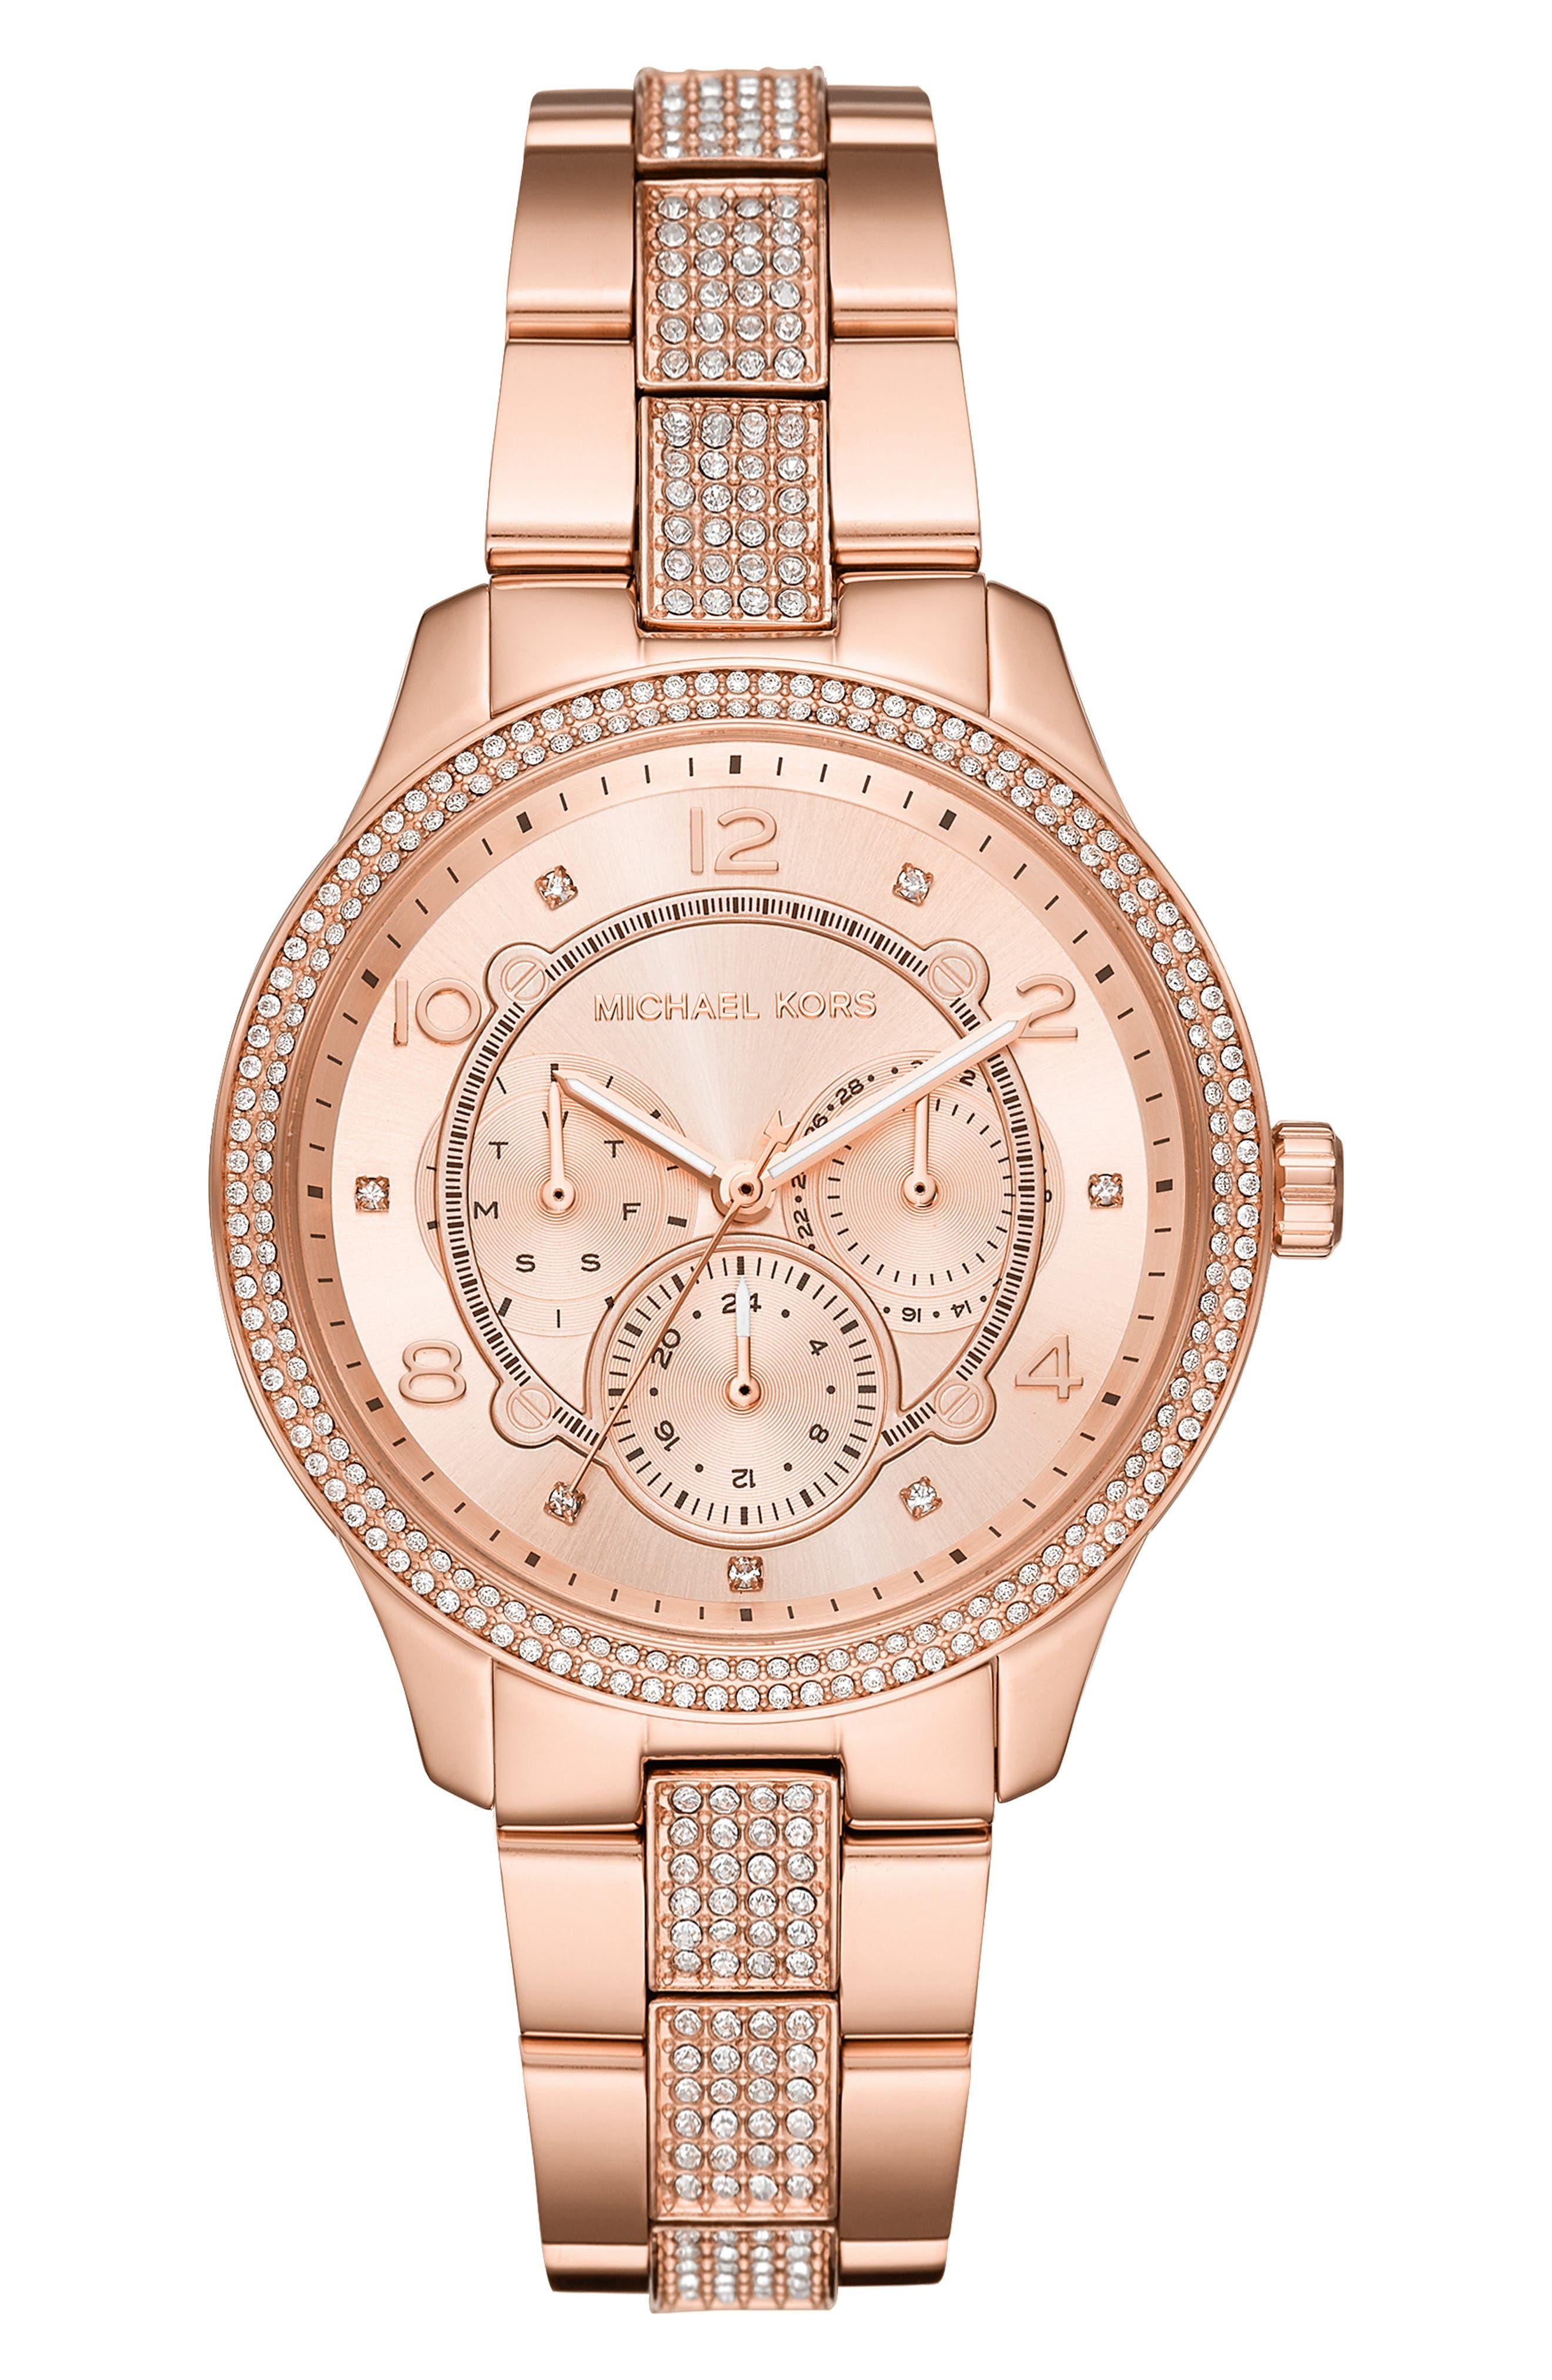 8864704c3b1b michael kors rose gold watch